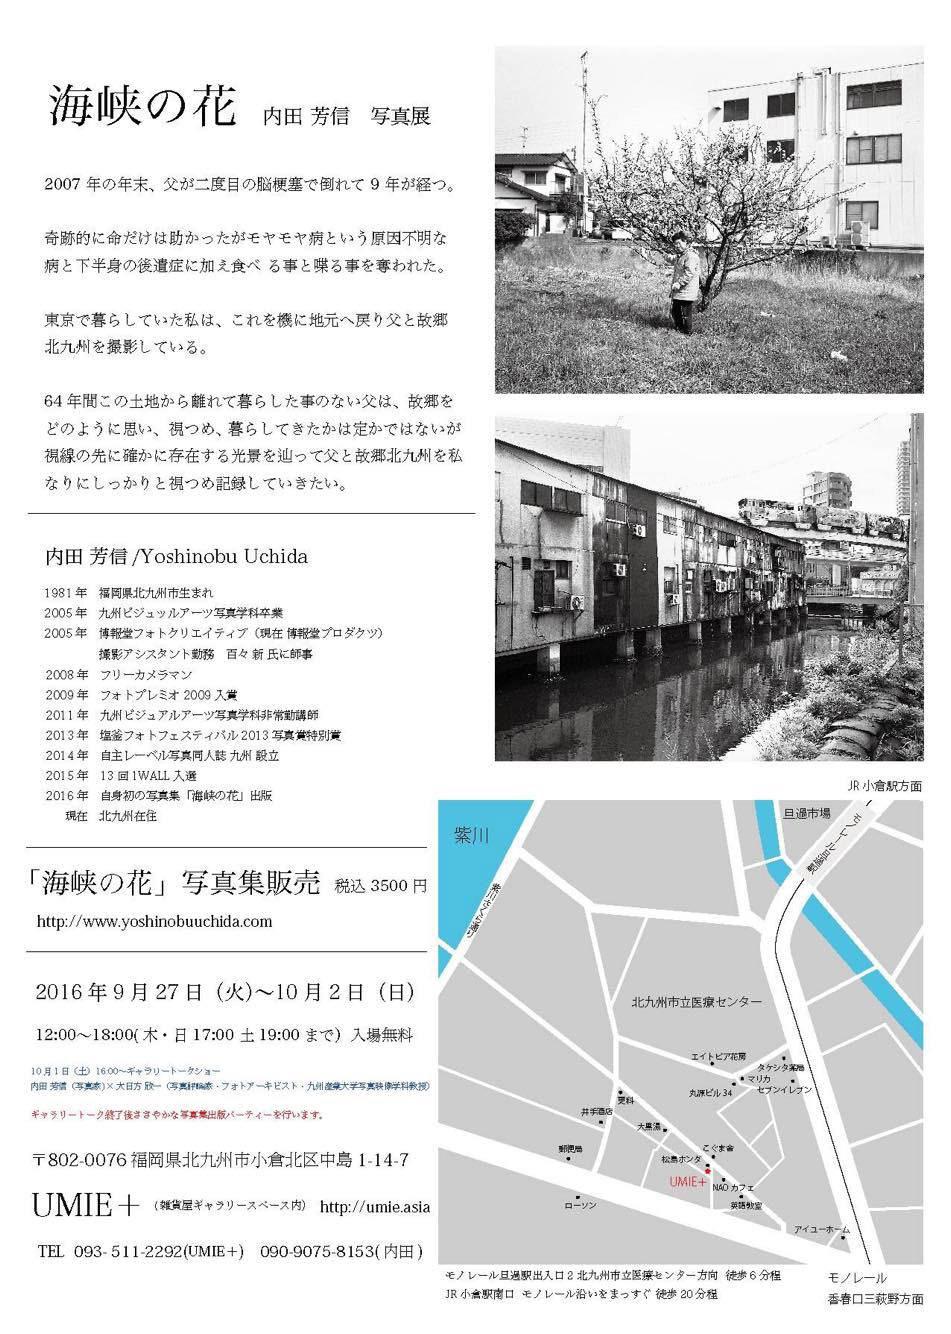 umei-201609-内田芳信写真展 海峡の花-DM裏